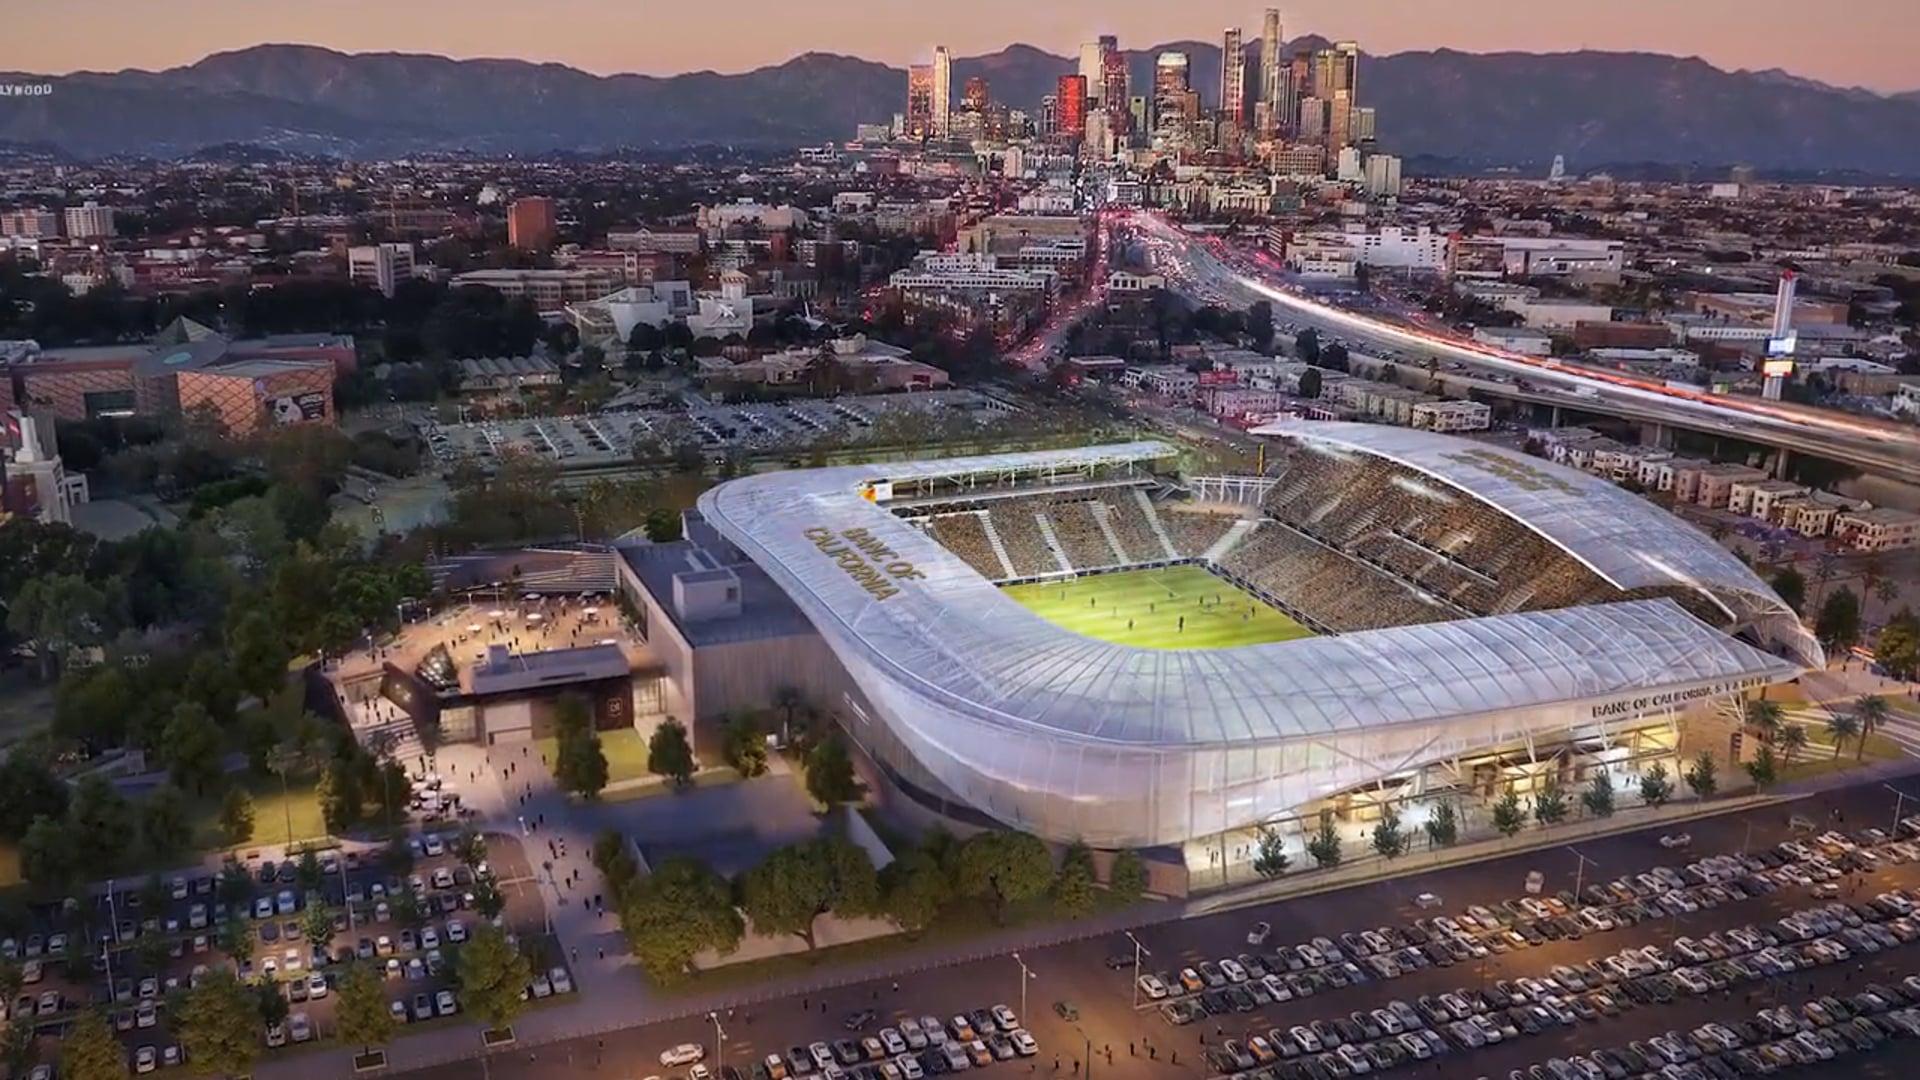 Building the Los Angeles Football Club